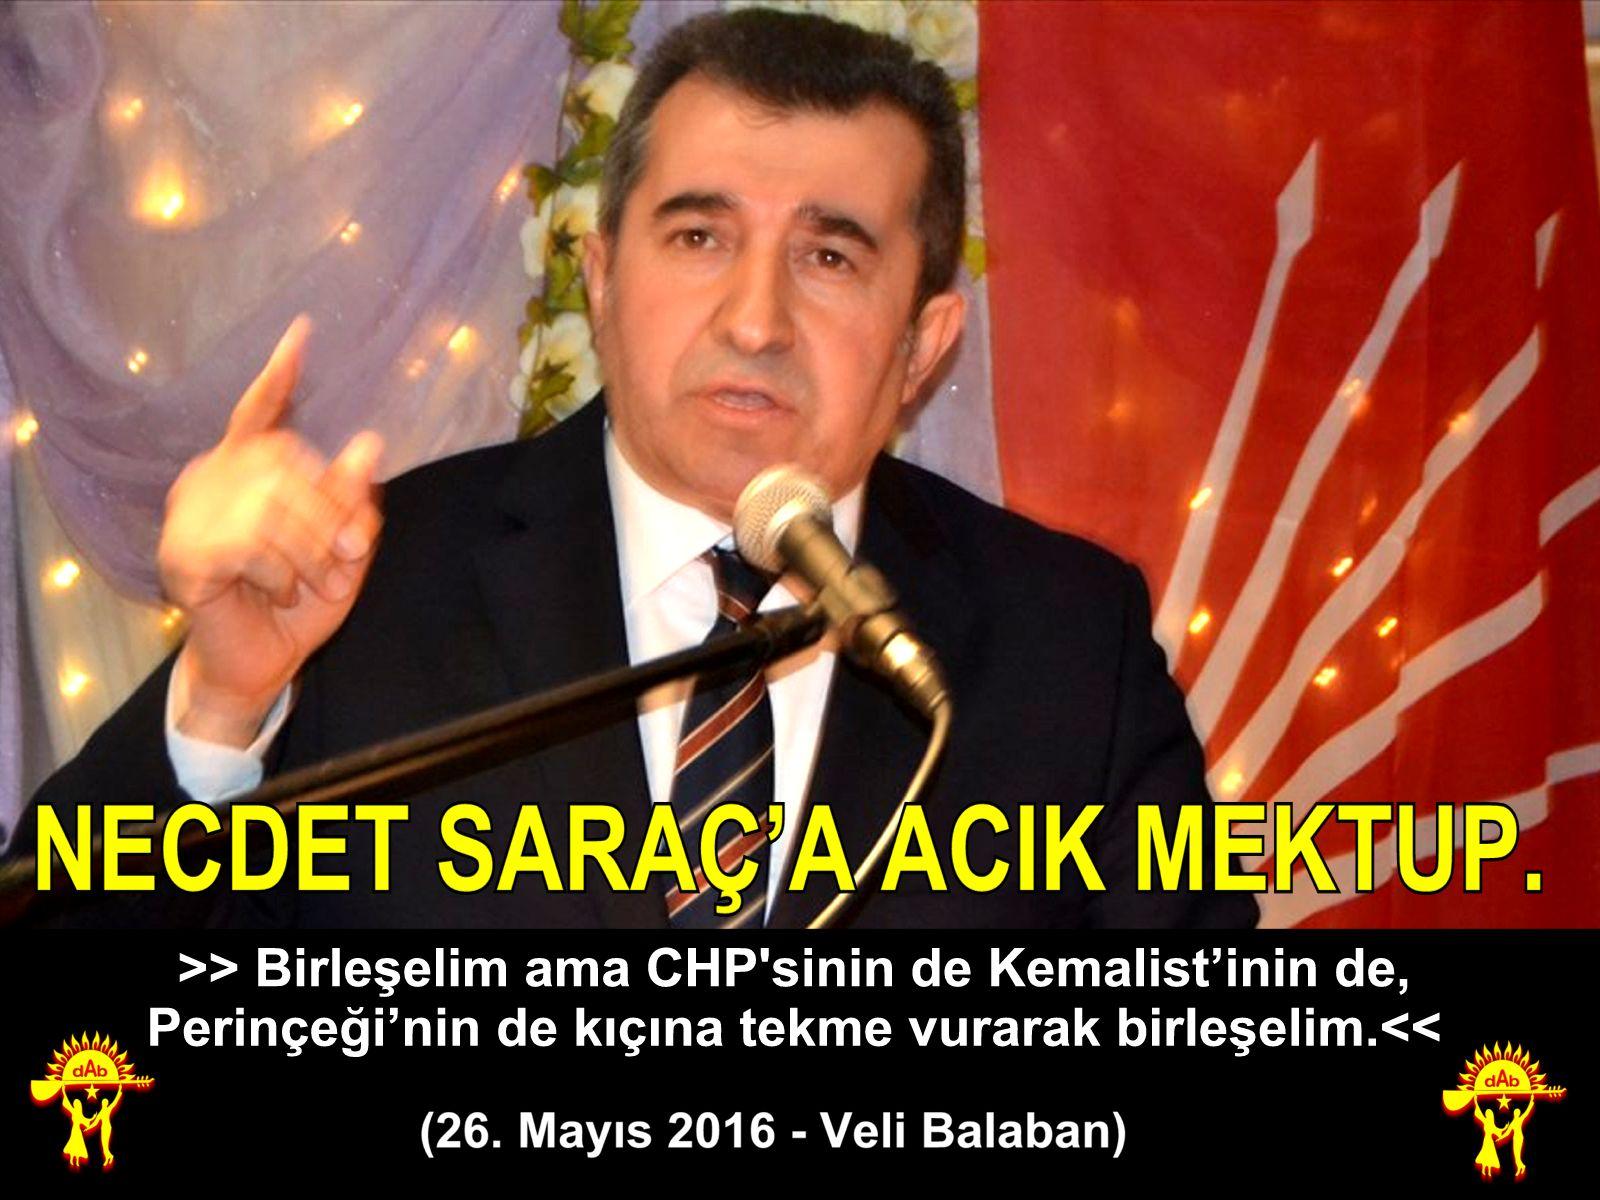 Devrimci Aleviler Birliği DAB Alevi Kızılbaş Bektaşi pir sultan cem hz Ali 12 imam semah Feramuz Şah Acar NS mektup